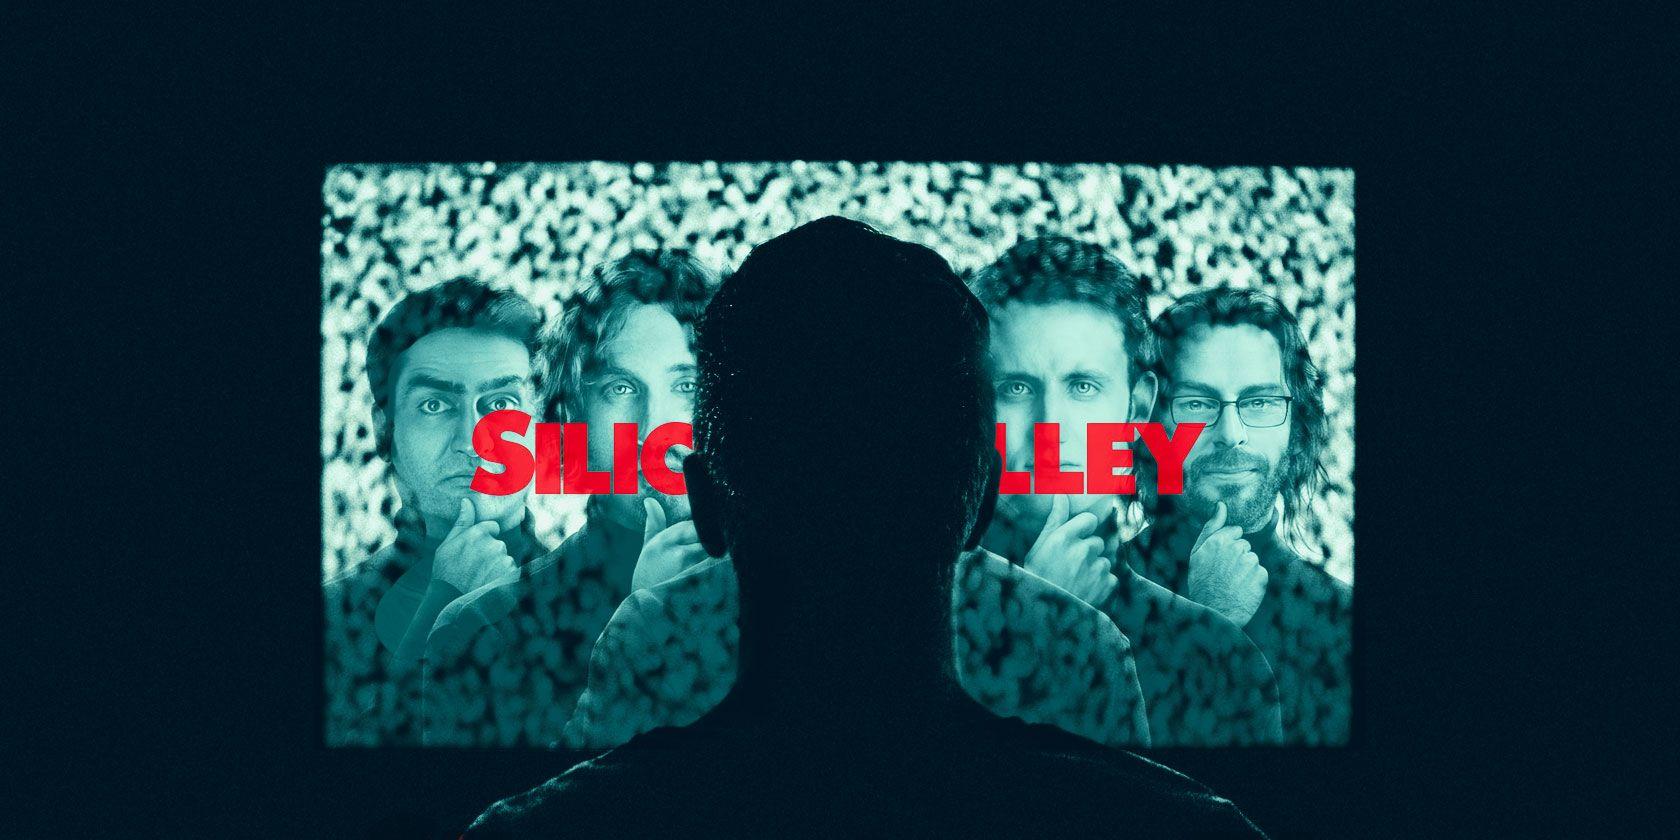 silicon-valley-tv-shows